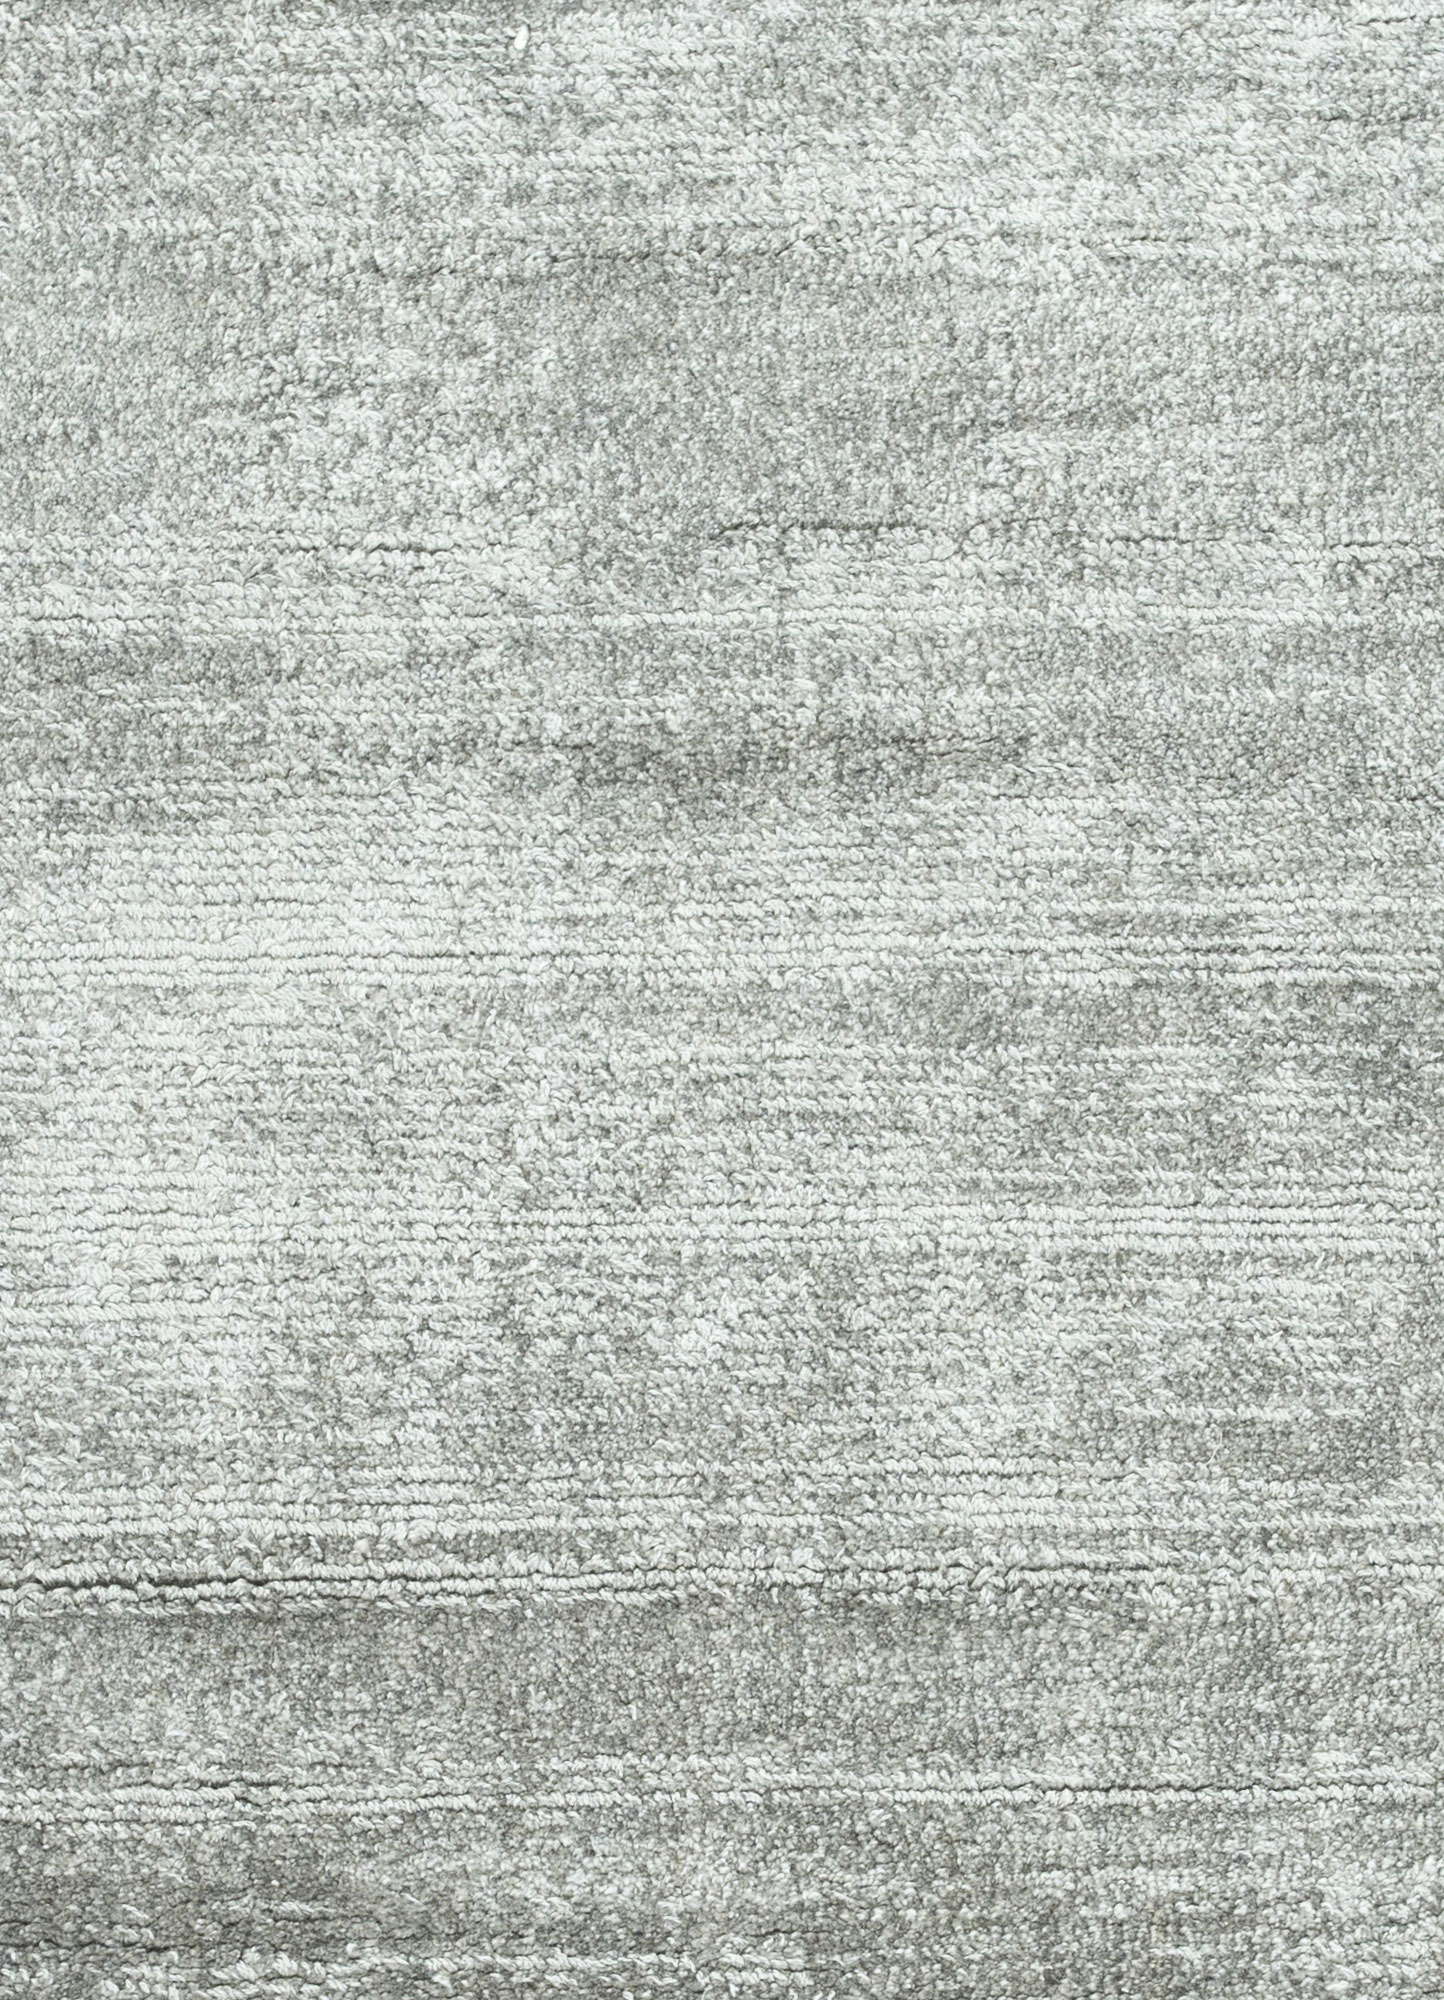 yasmin grey and black viscose hand loom Rug - CloseUp